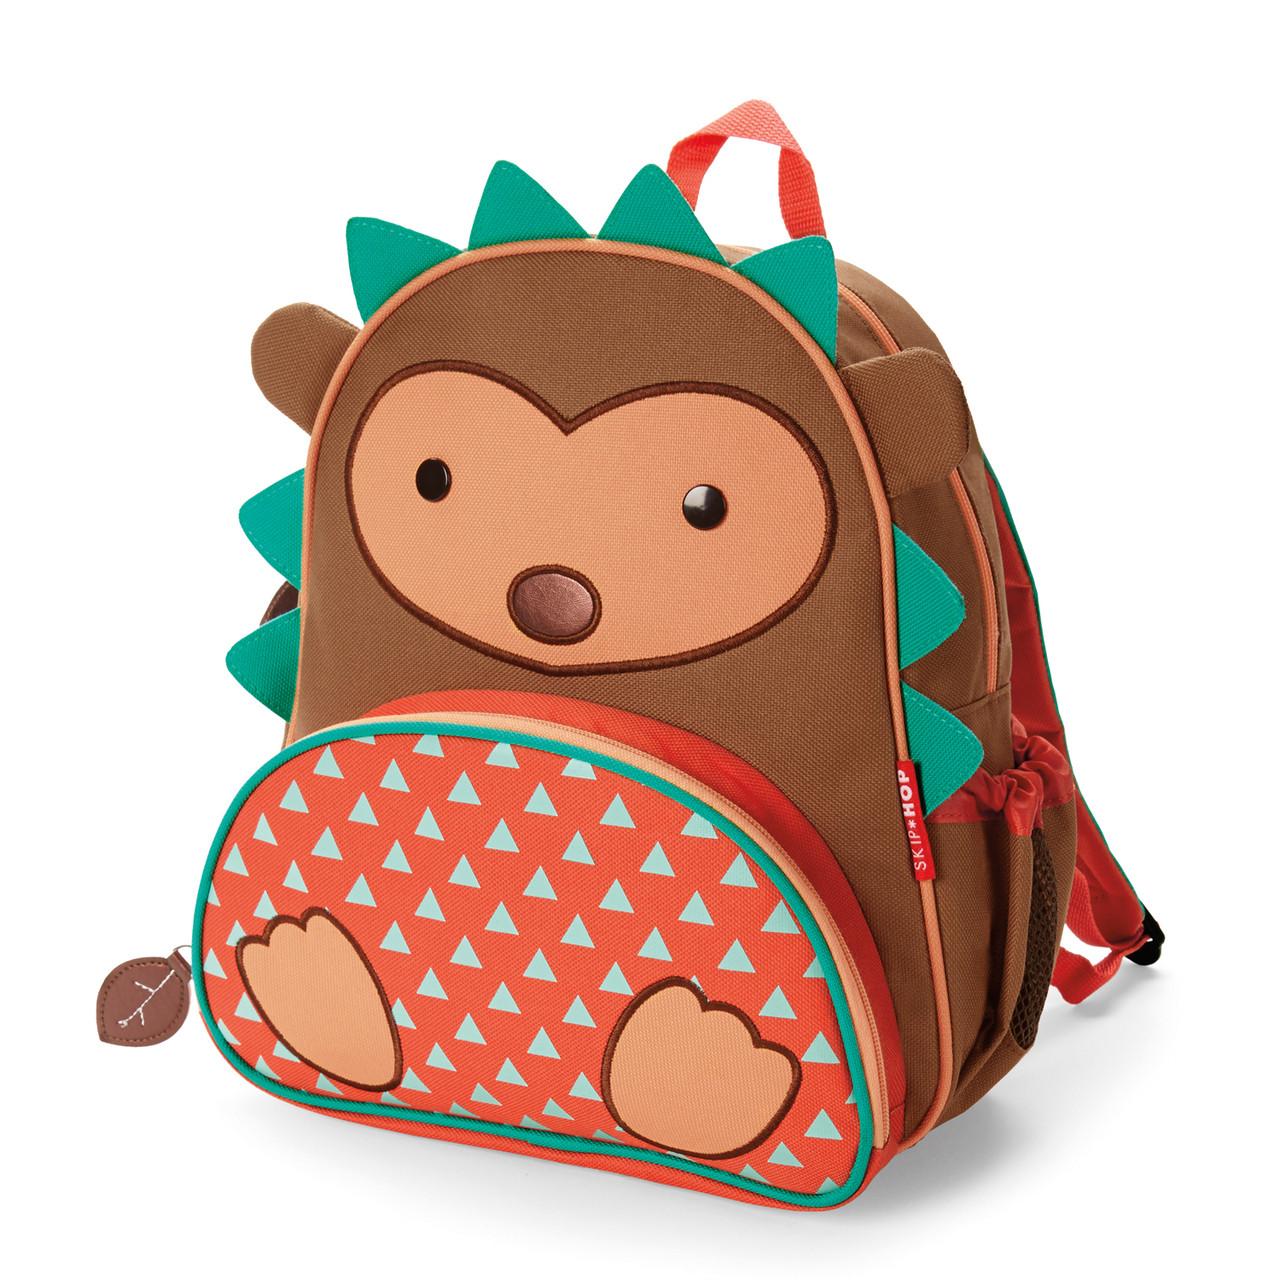 Childrens Backpacks - Skip Hop Zoo Pack Hedgehog 5f9276d885